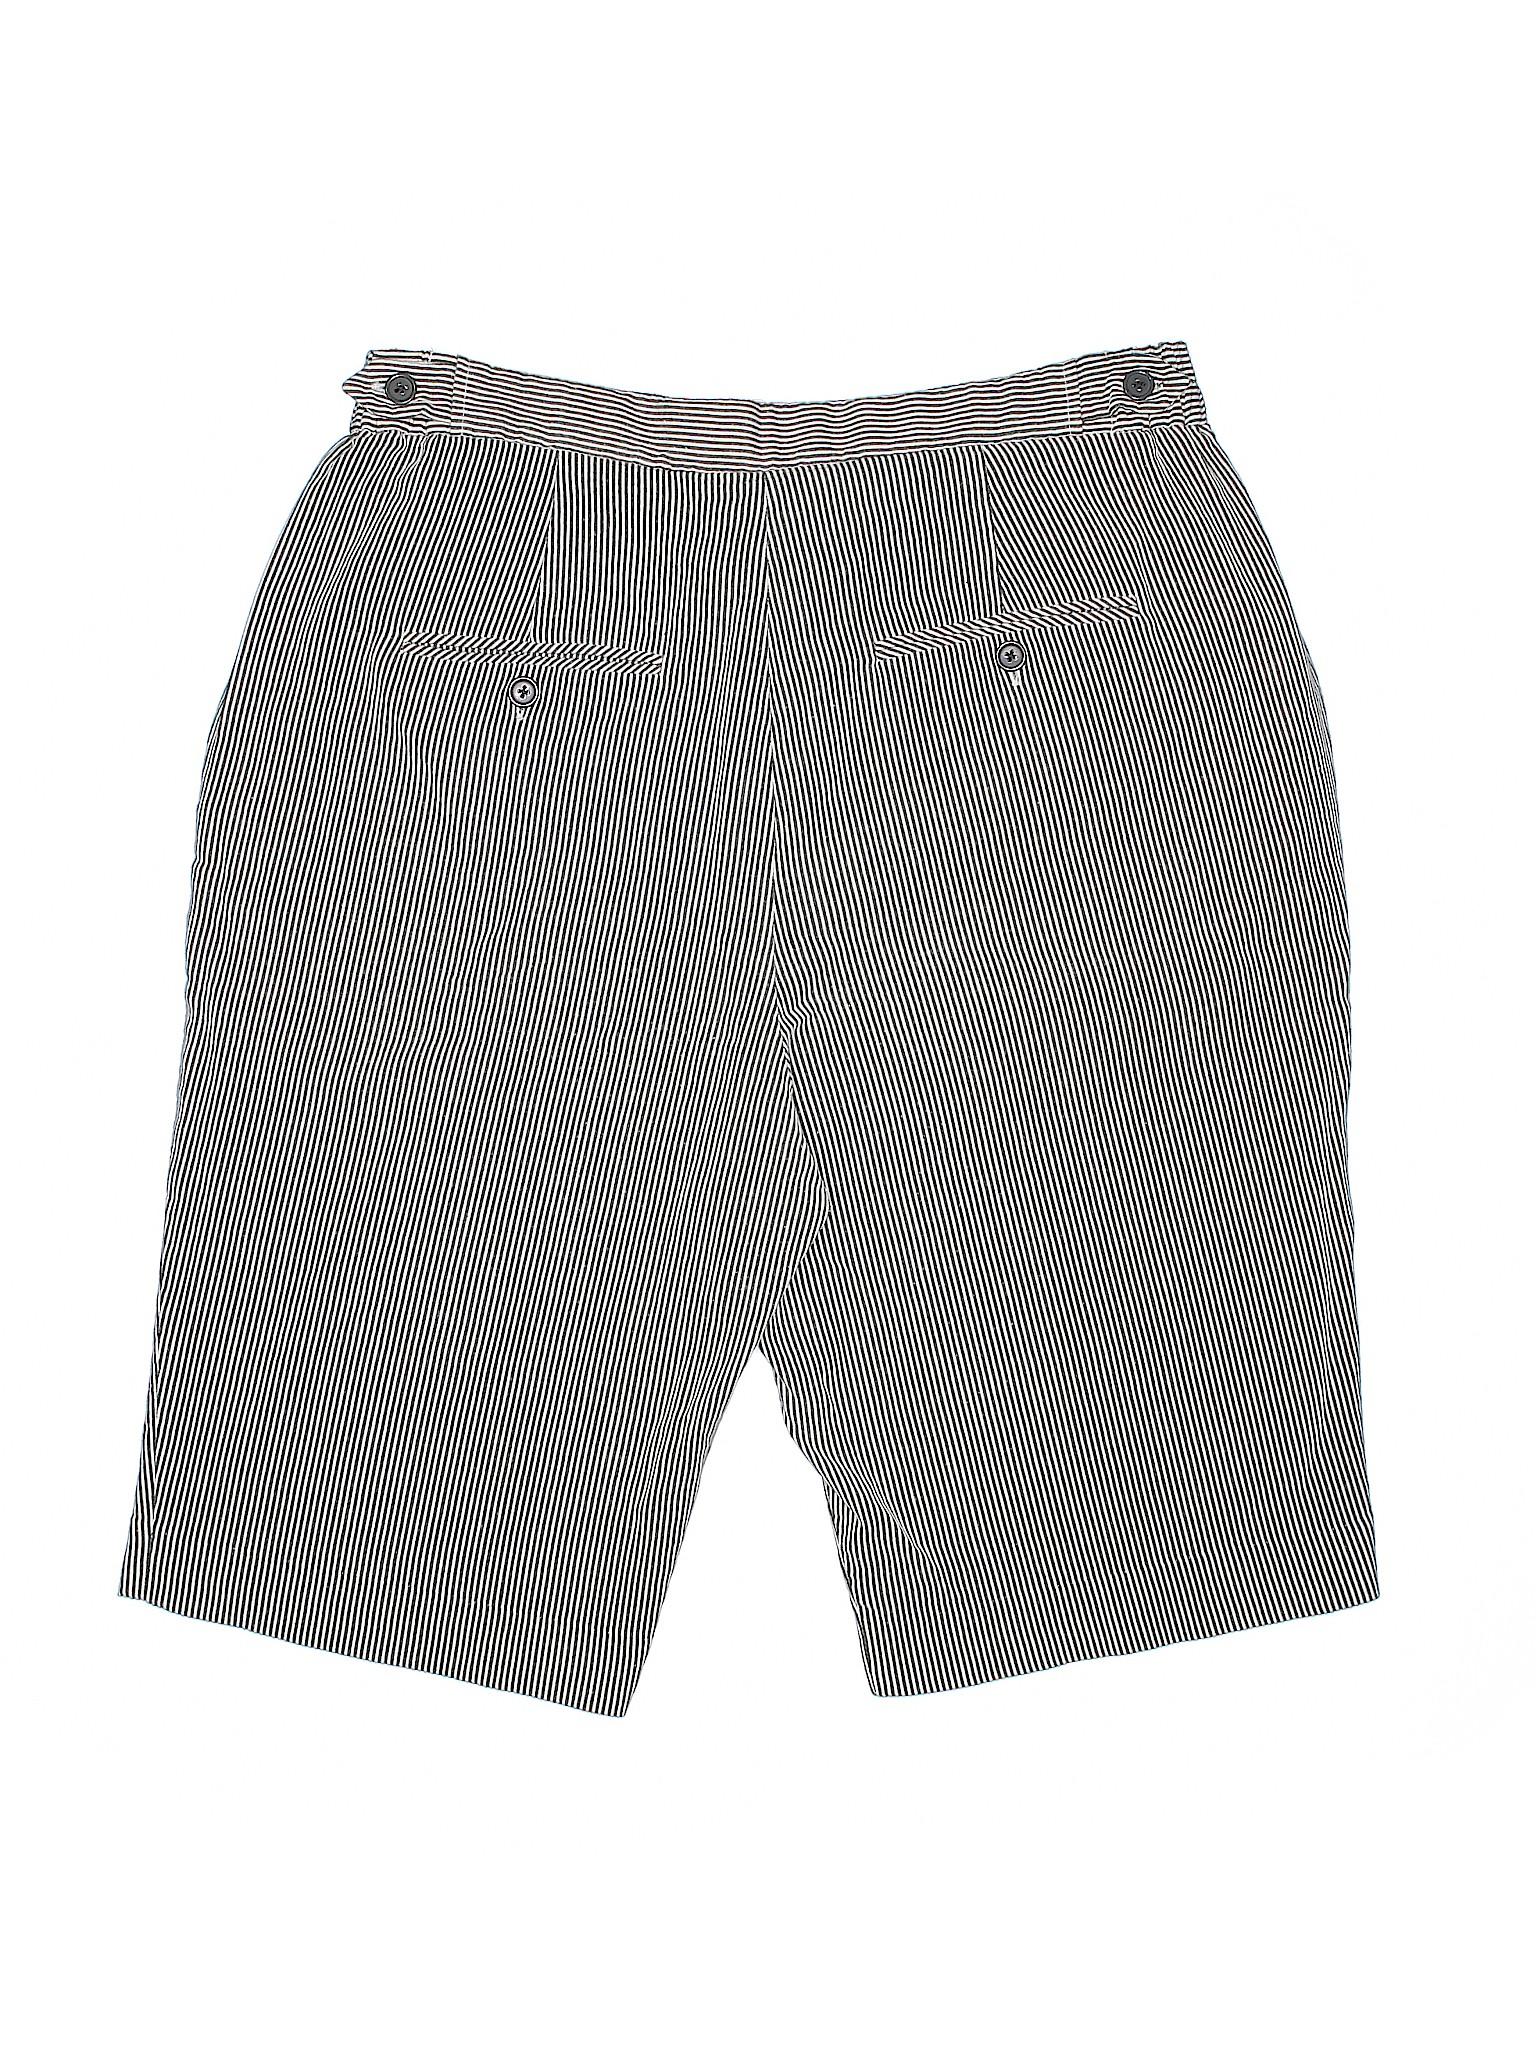 Boutique Shorts Levine Shorts Levine Khaki Boutique Larry Khaki Larry 5Hw7Rw